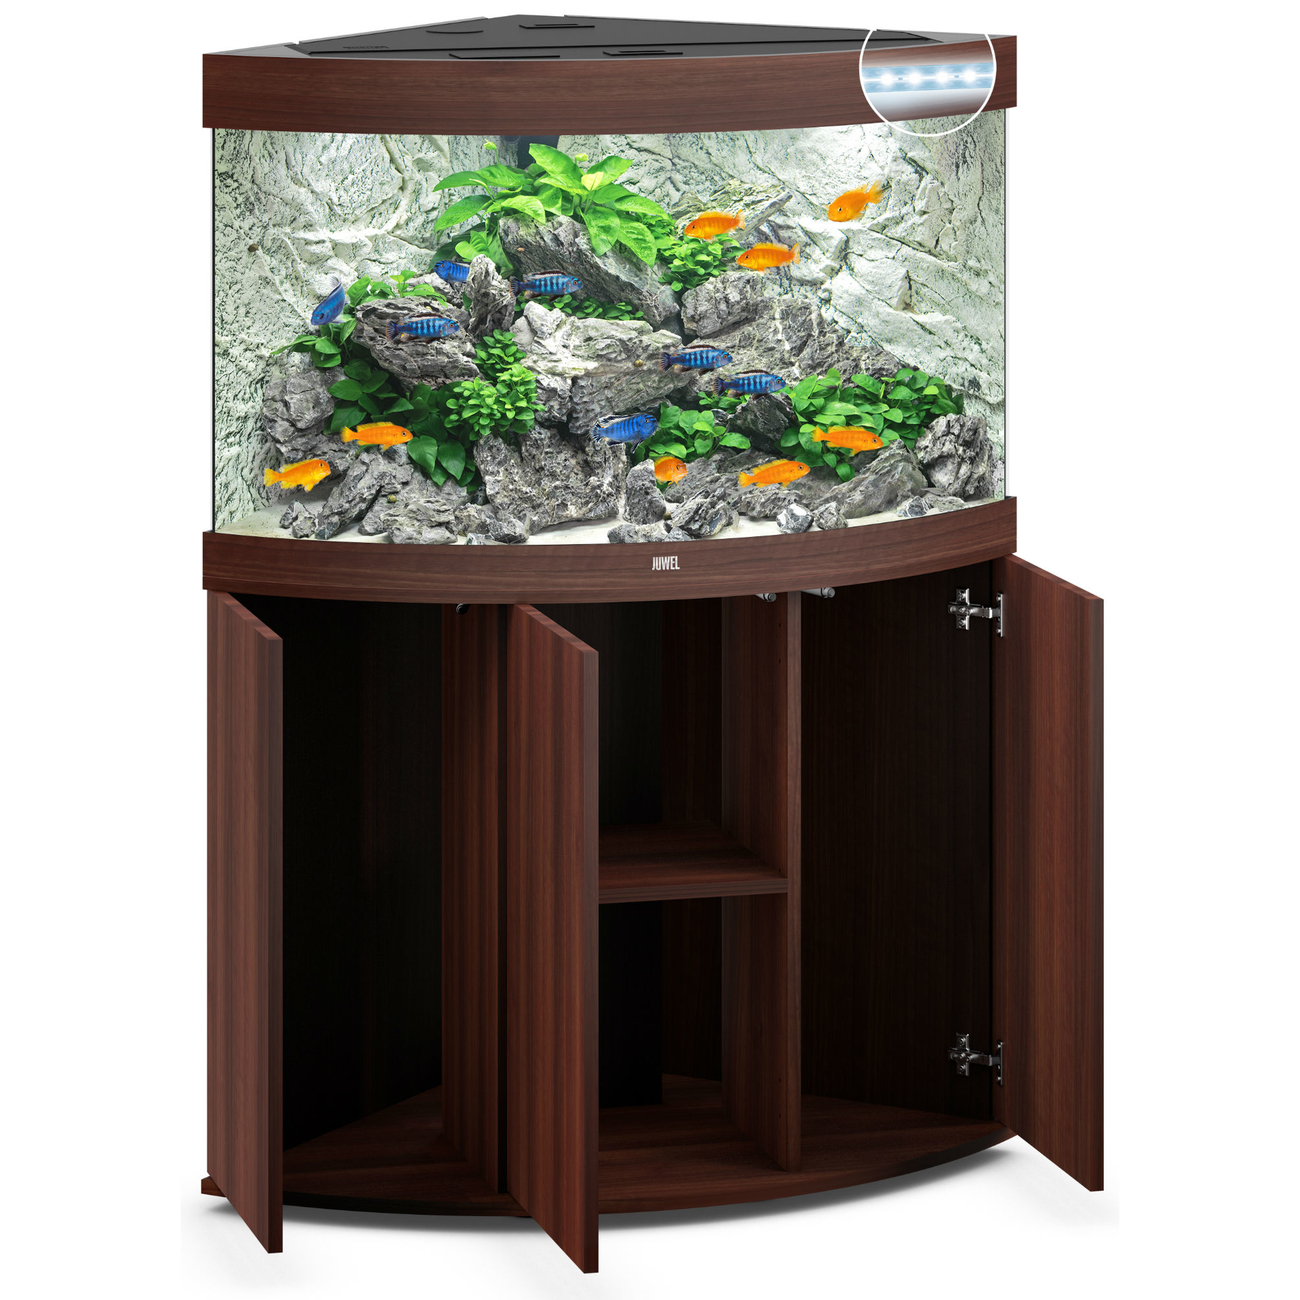 Juwel Trigon 190 LED Eck-Aquarium mit Unterschrank, Bild 16